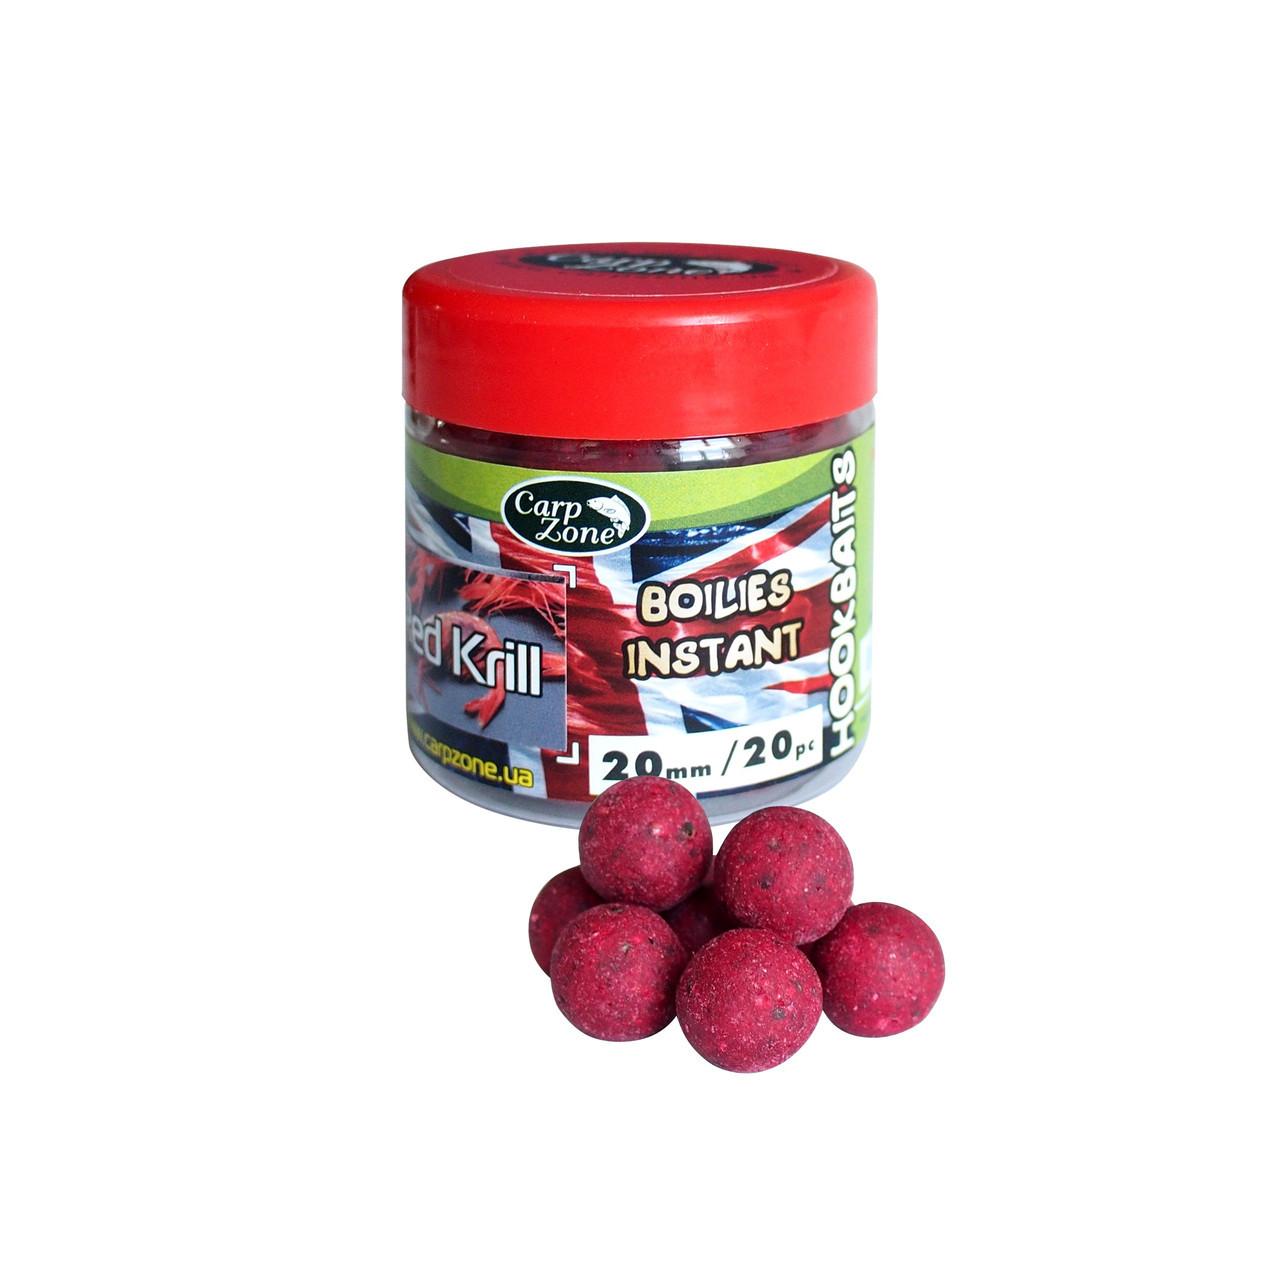 Бойлы насадочные вареные Boilies English series Instant Hookbaits Red Кrill 20mm  / 20pc